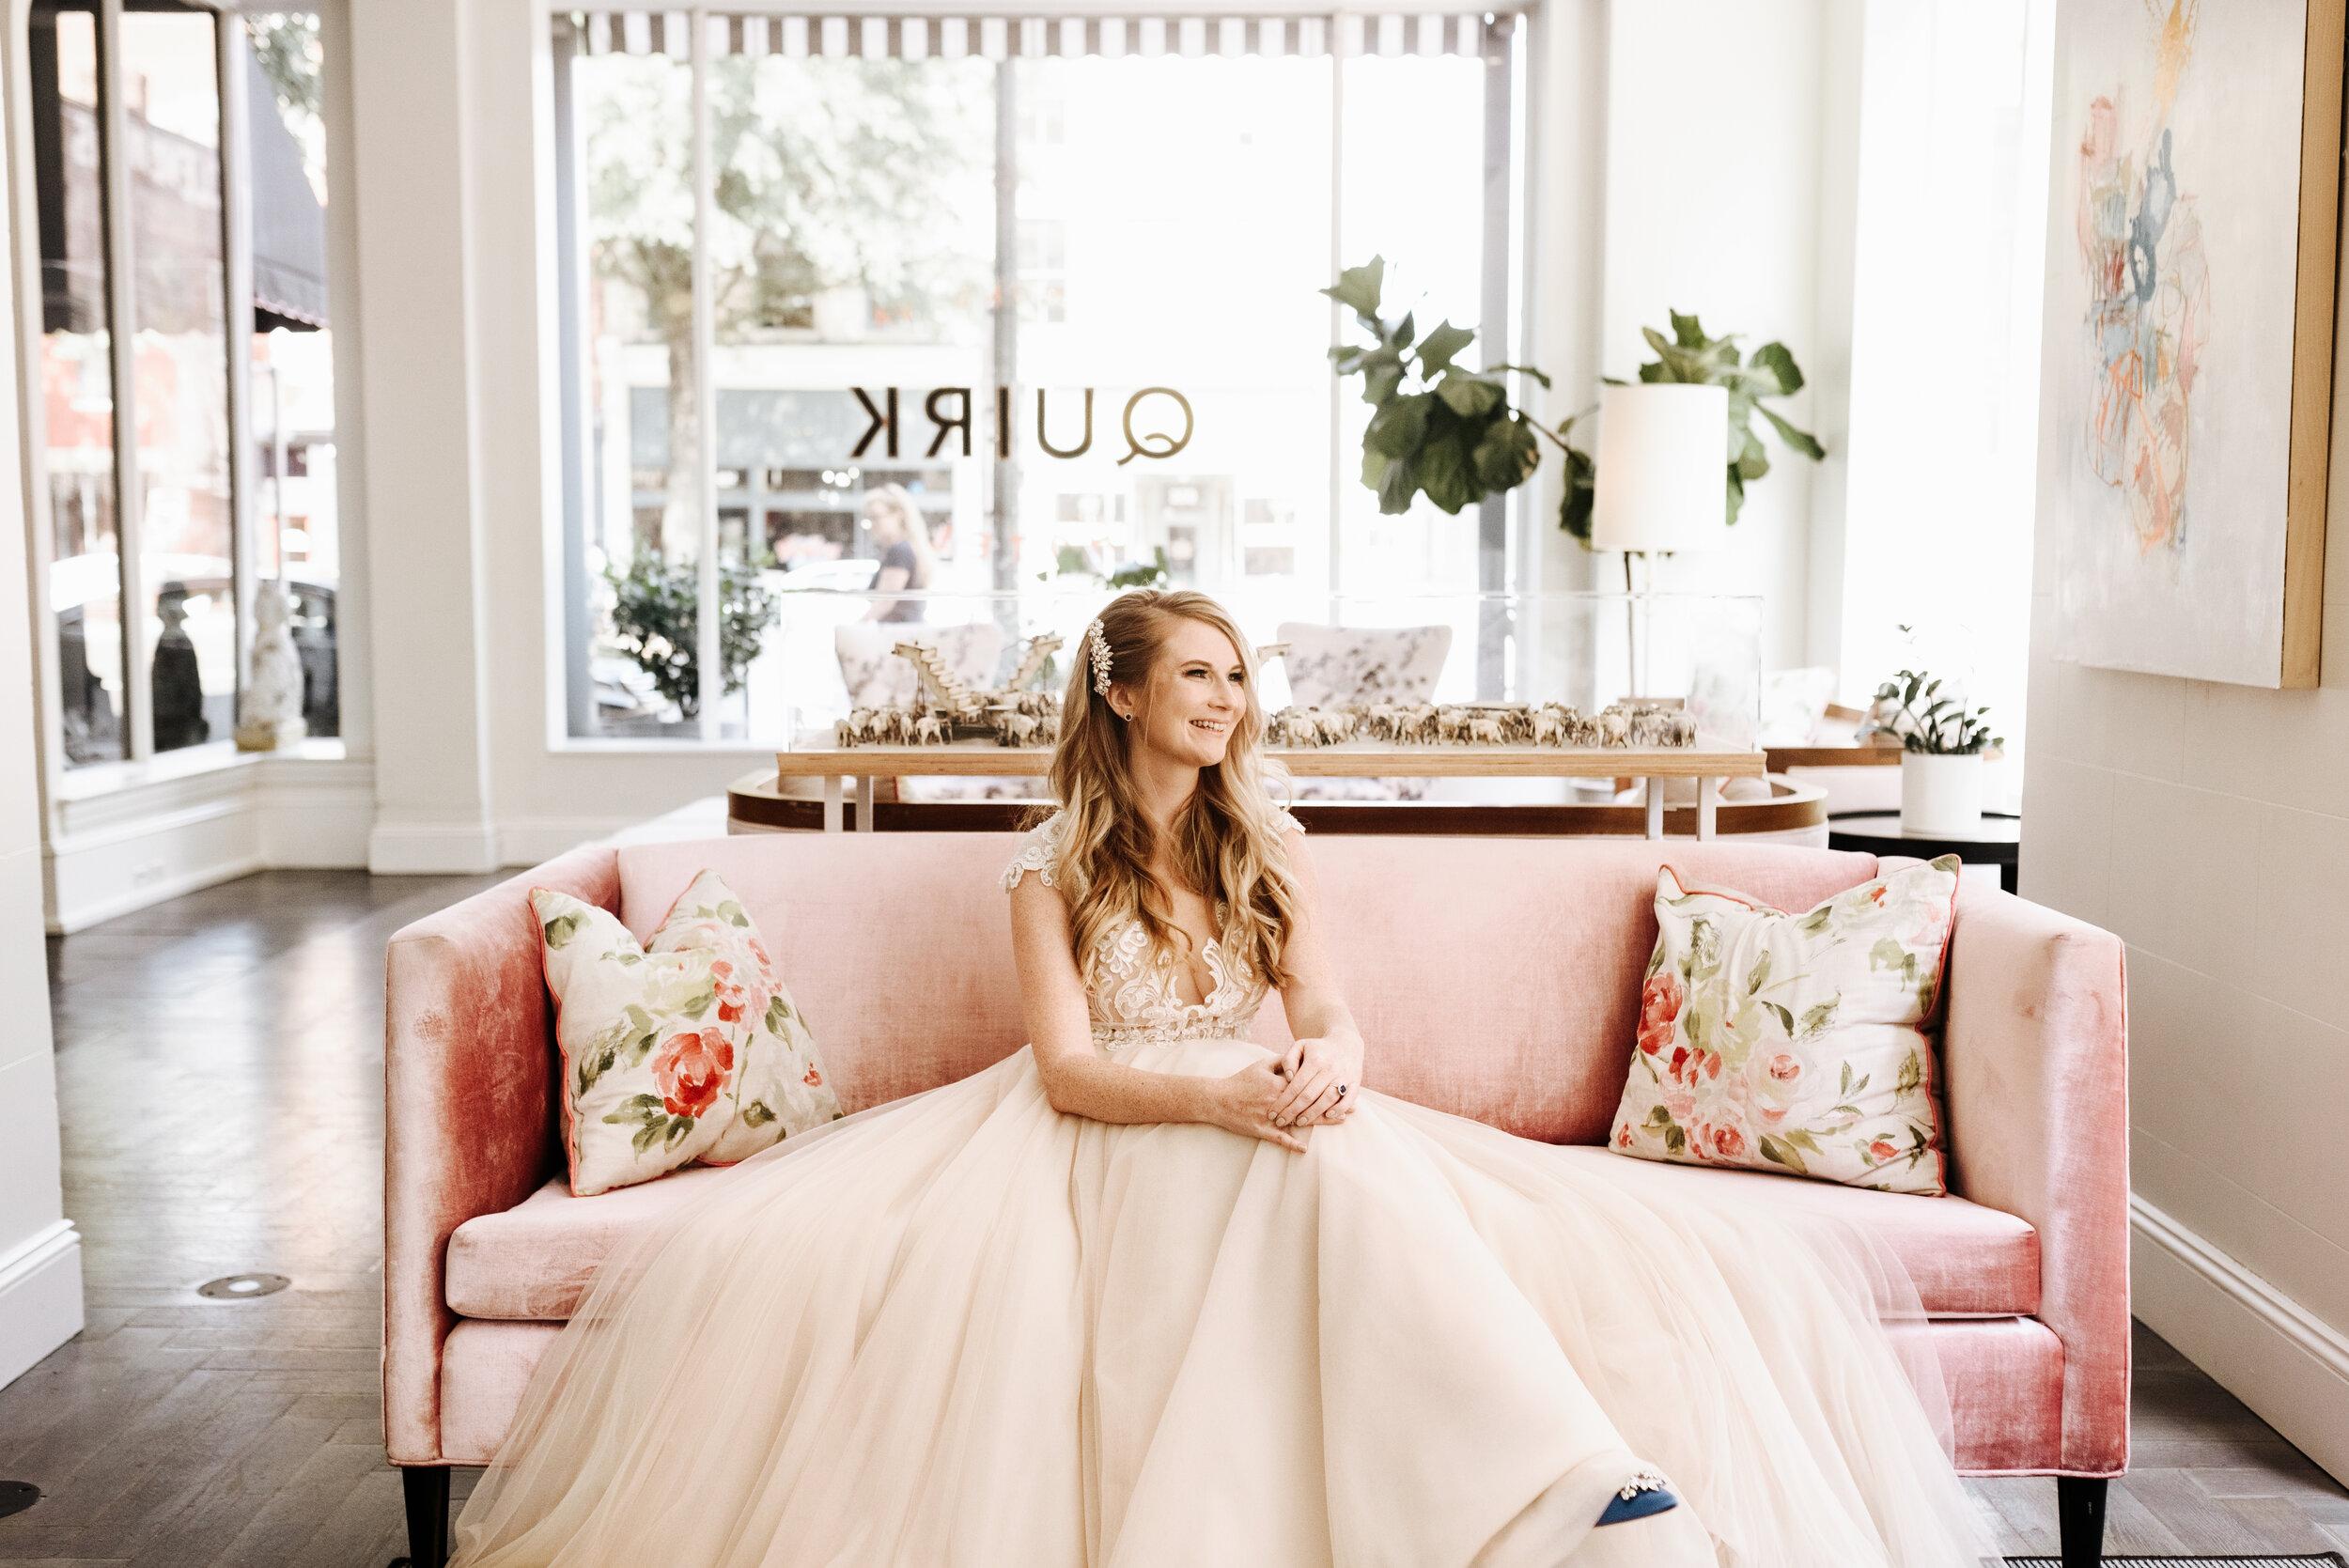 Cassie-Mrunal-Wedding-Quirk-Hotel-John-Marshall-Ballrooms-Richmond-Virginia-Photography-by-V-21.jpg